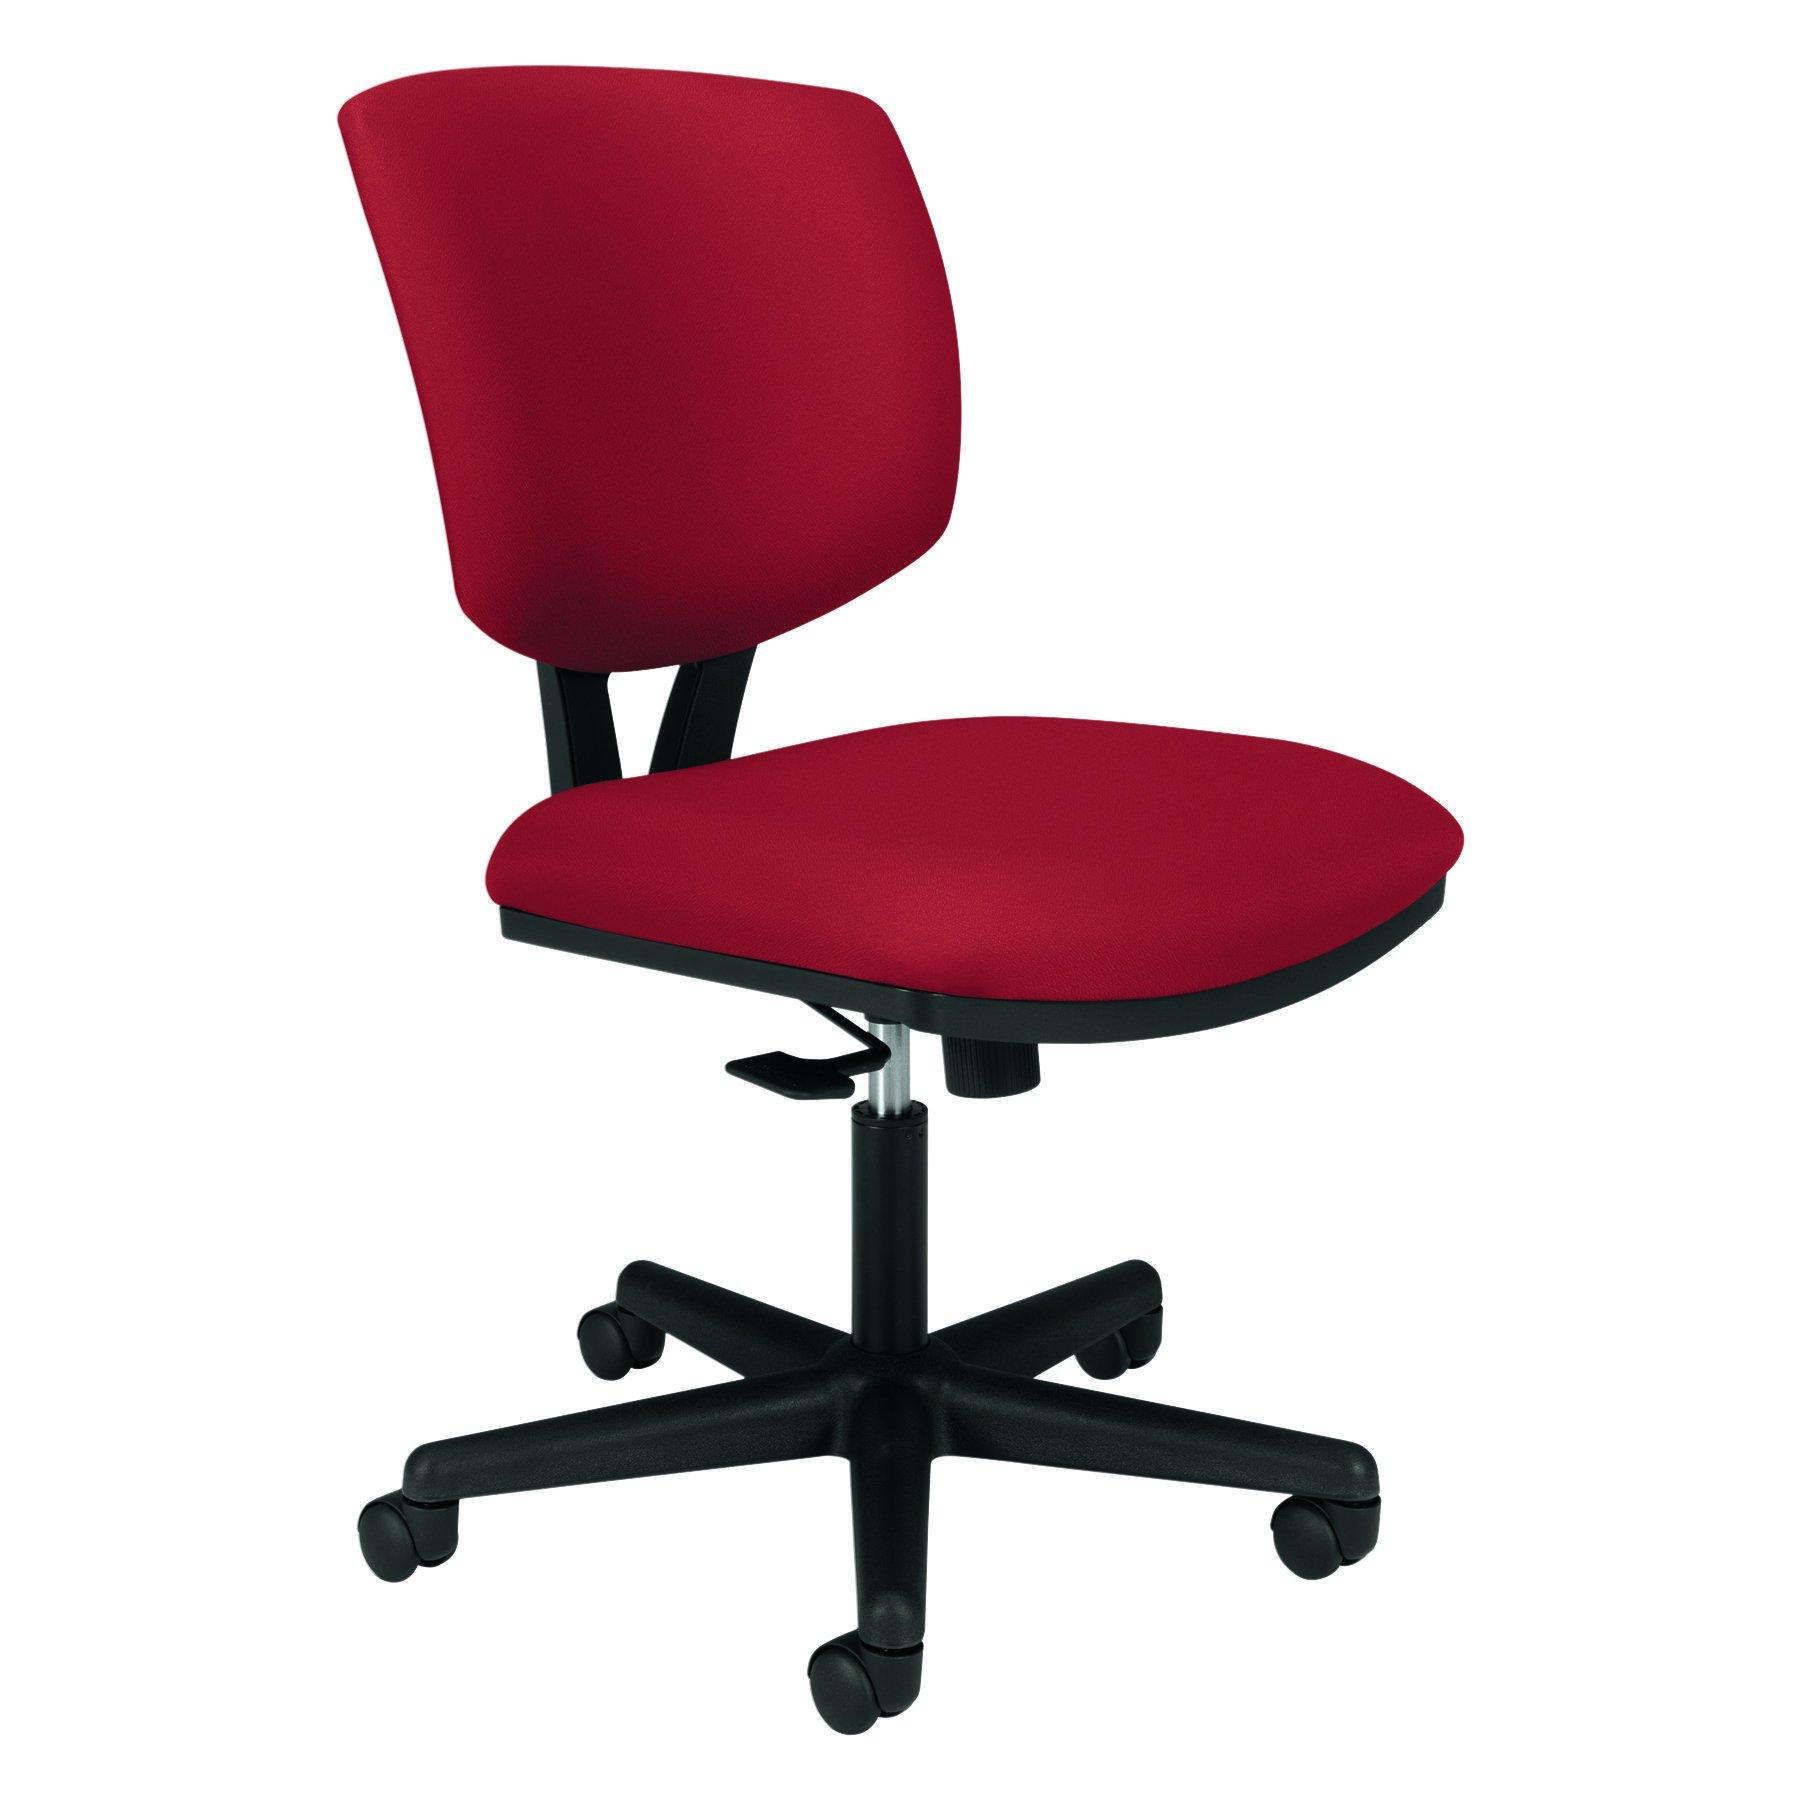 HON Volt Task Chair - Upholstered Computer Chair for Office Desk, Crimson (HH5701)